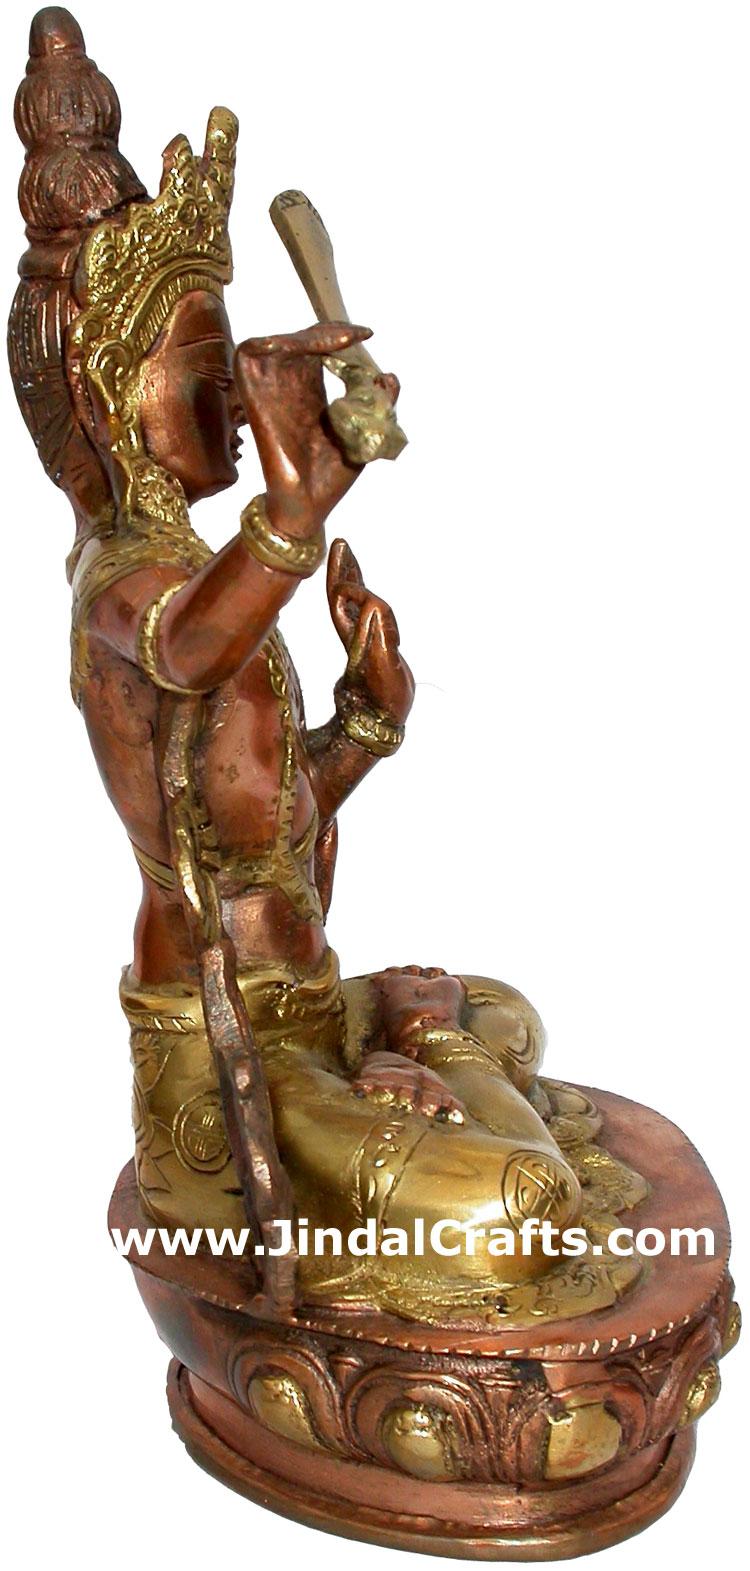 tara antique finish buddhism statues figures home decor. Black Bedroom Furniture Sets. Home Design Ideas